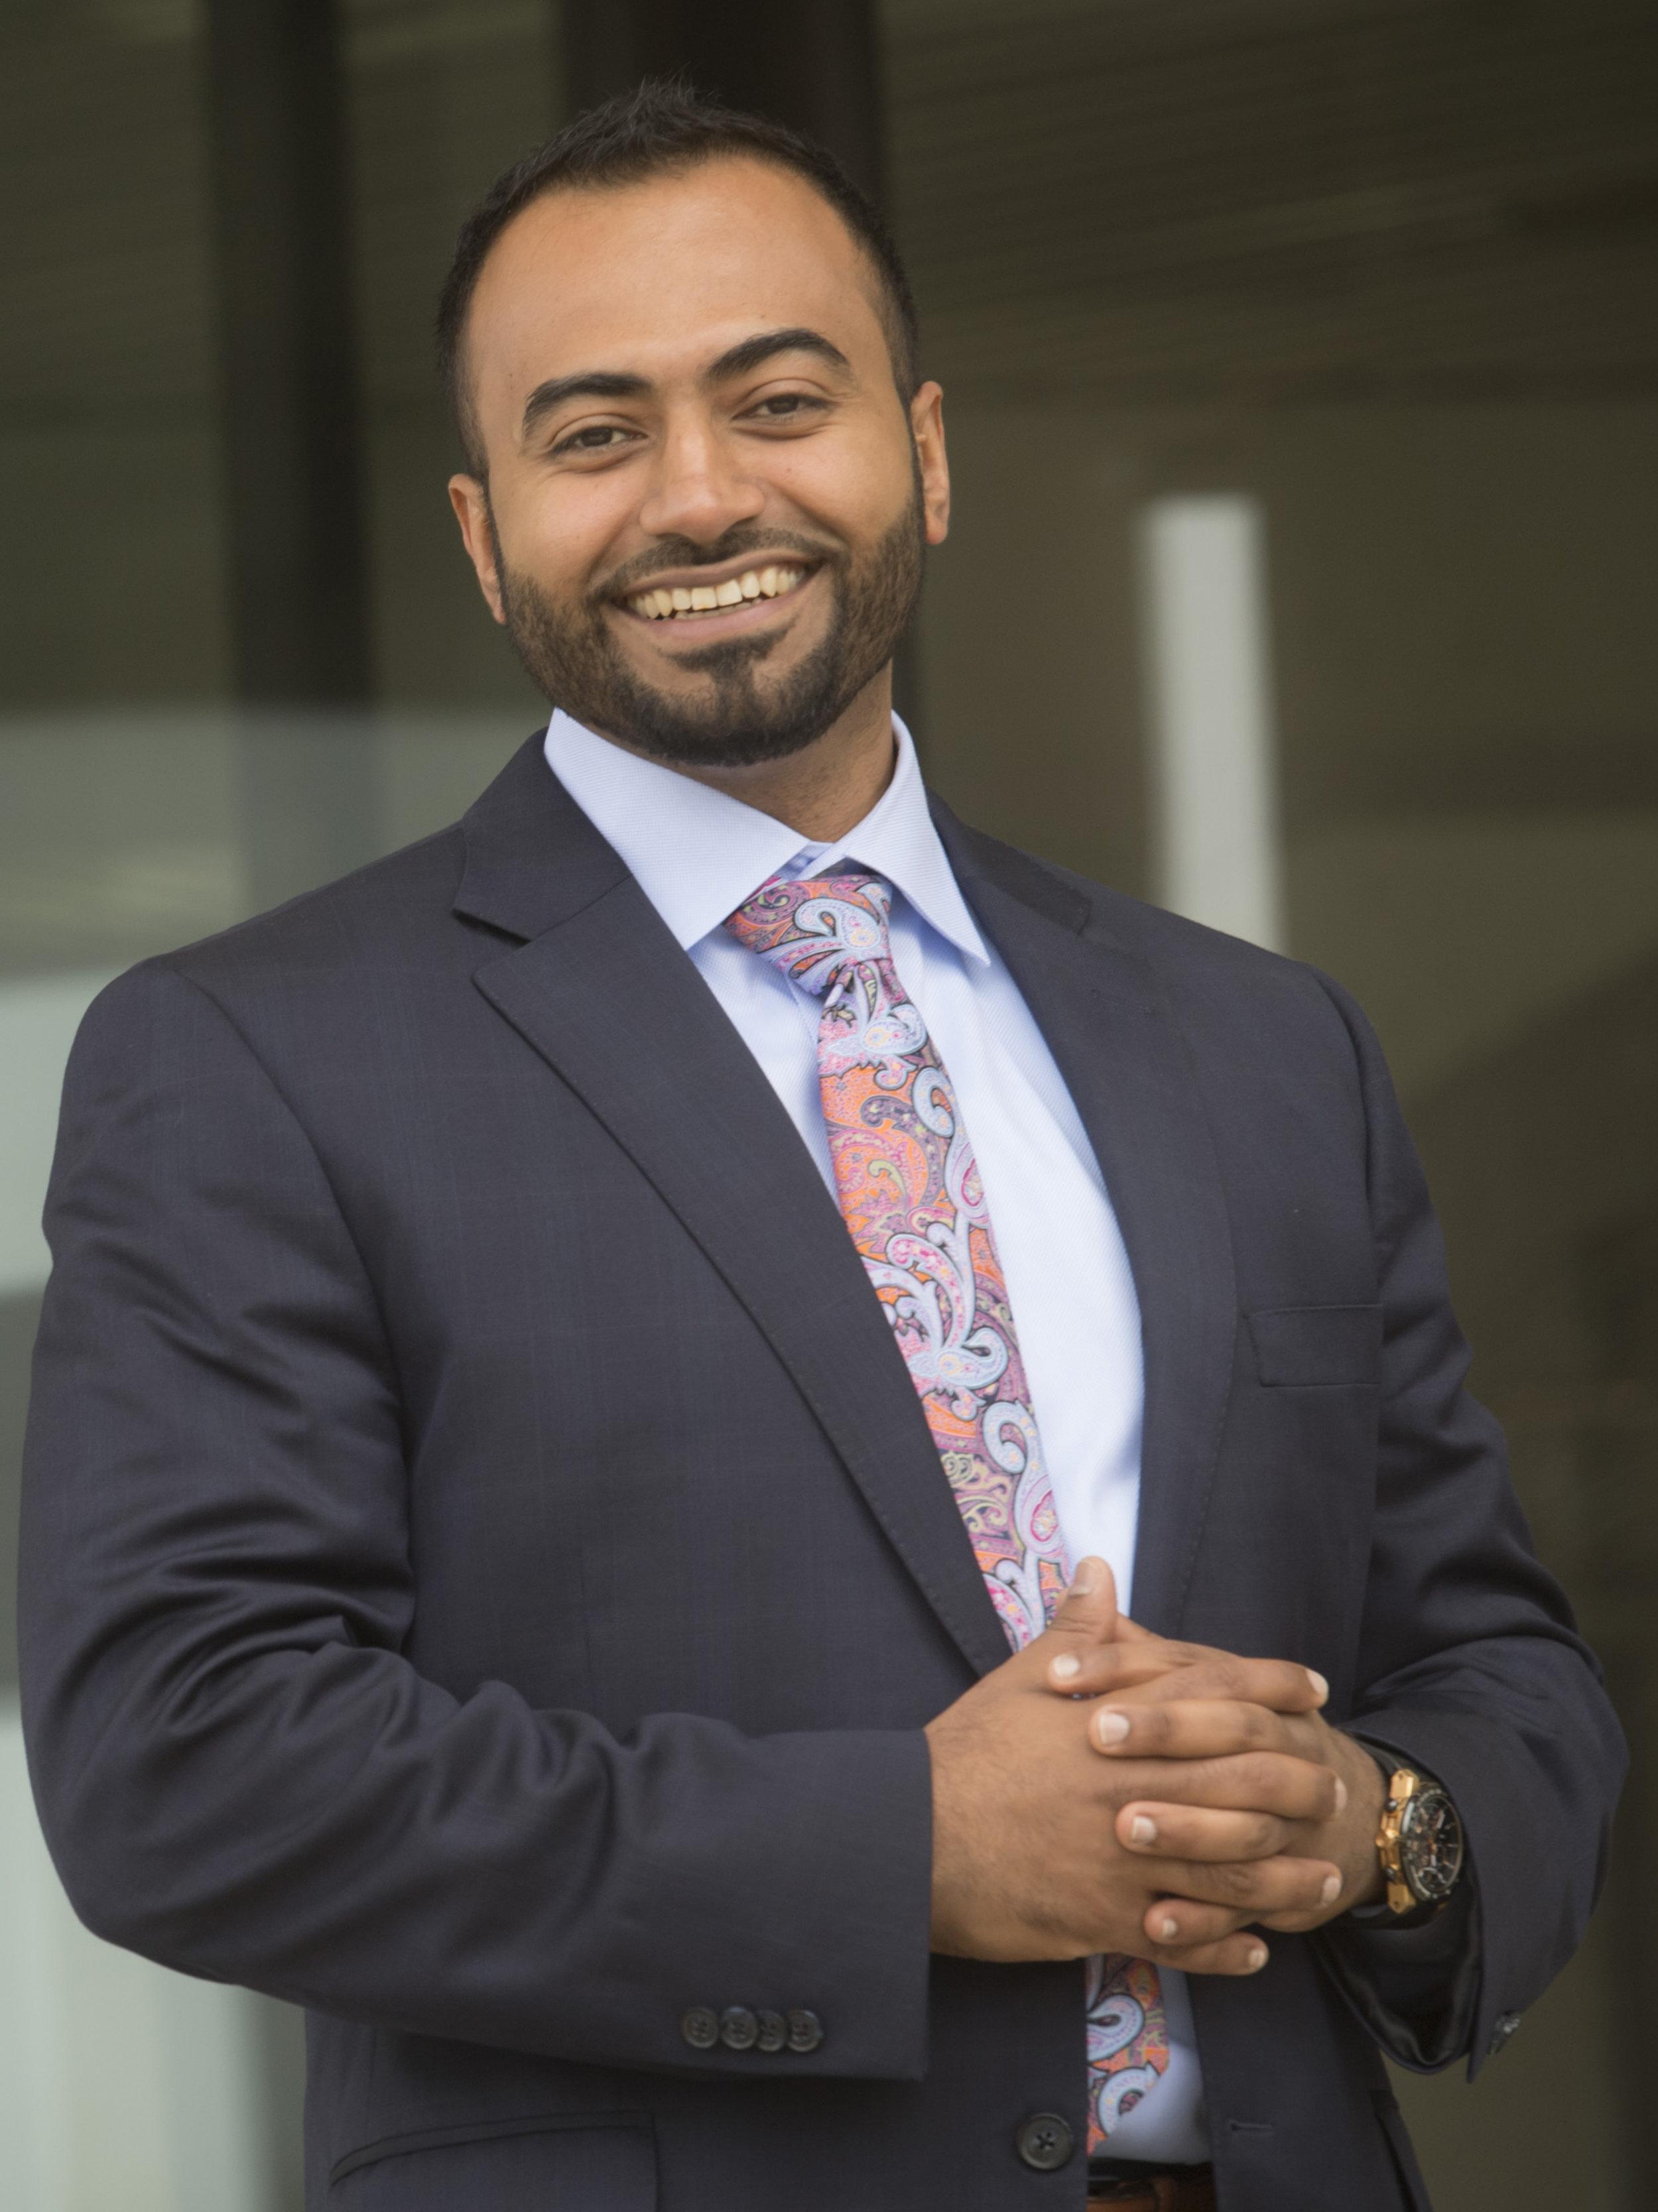 Dr. Abdullah Al-Bahrani - Northern Kentucky Universityalbahrania1@nku.edu